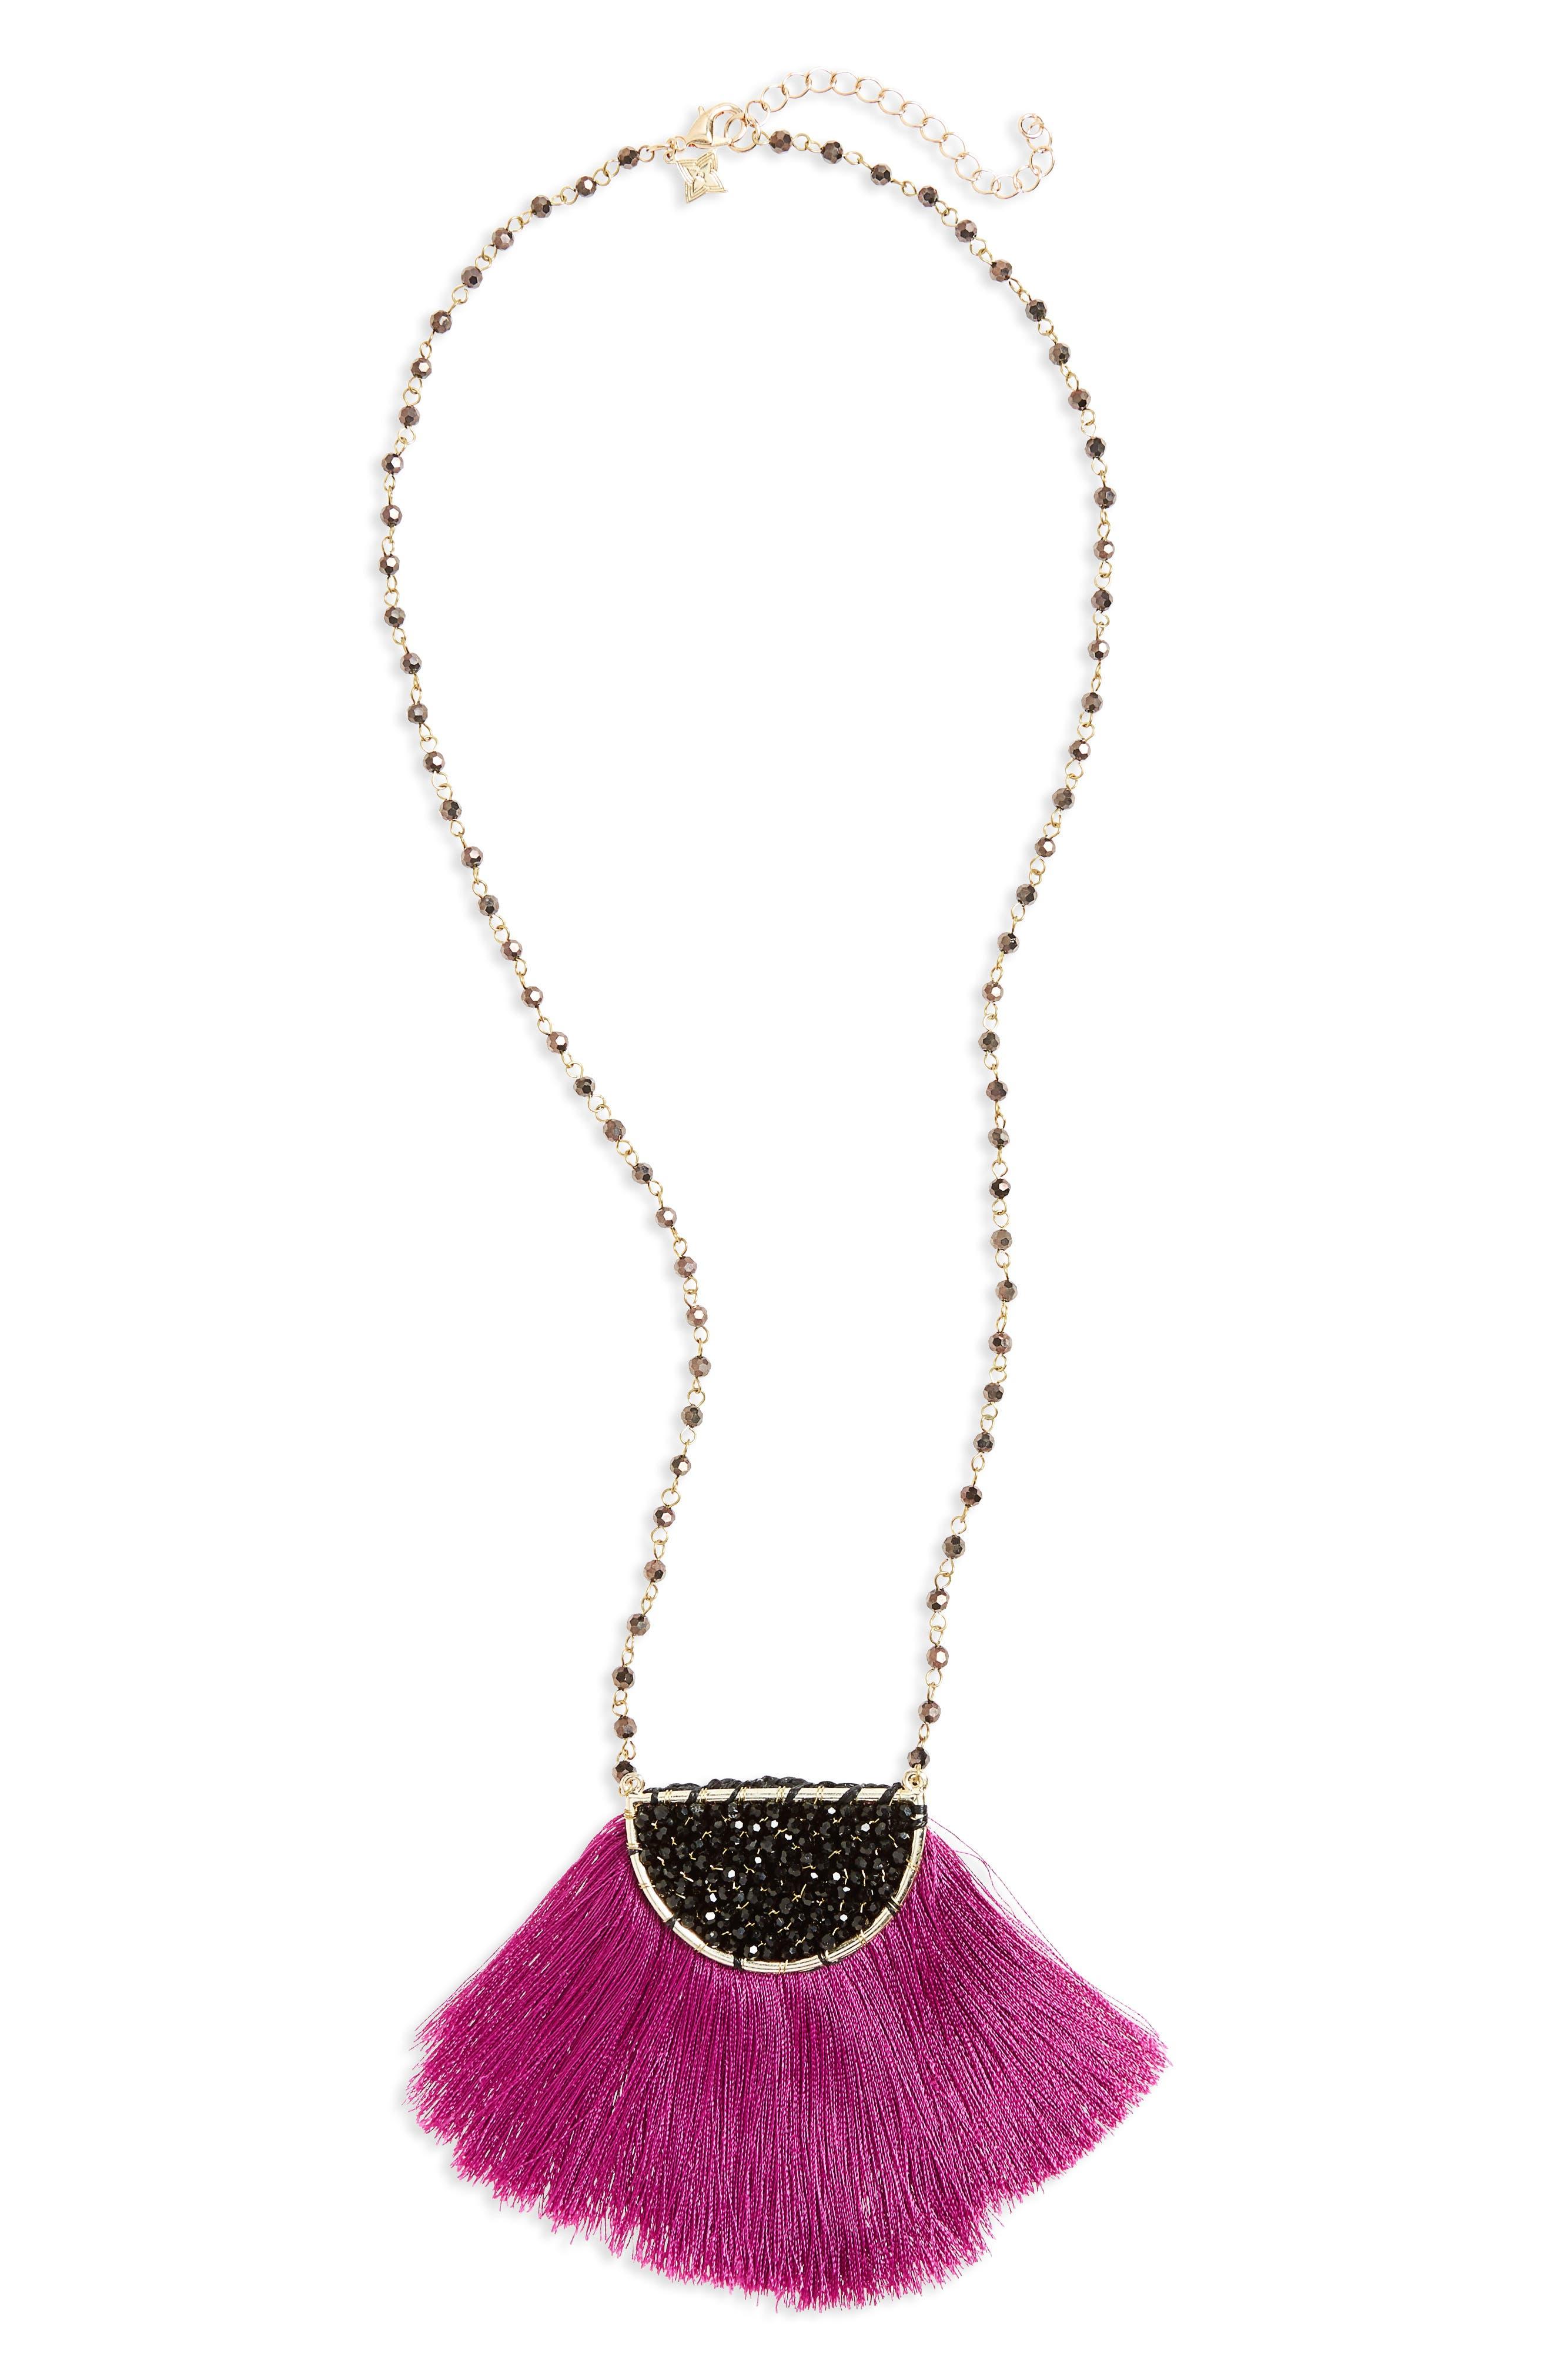 Fringe Pendant Necklace,                             Main thumbnail 1, color,                             Multi/ Fuchsia